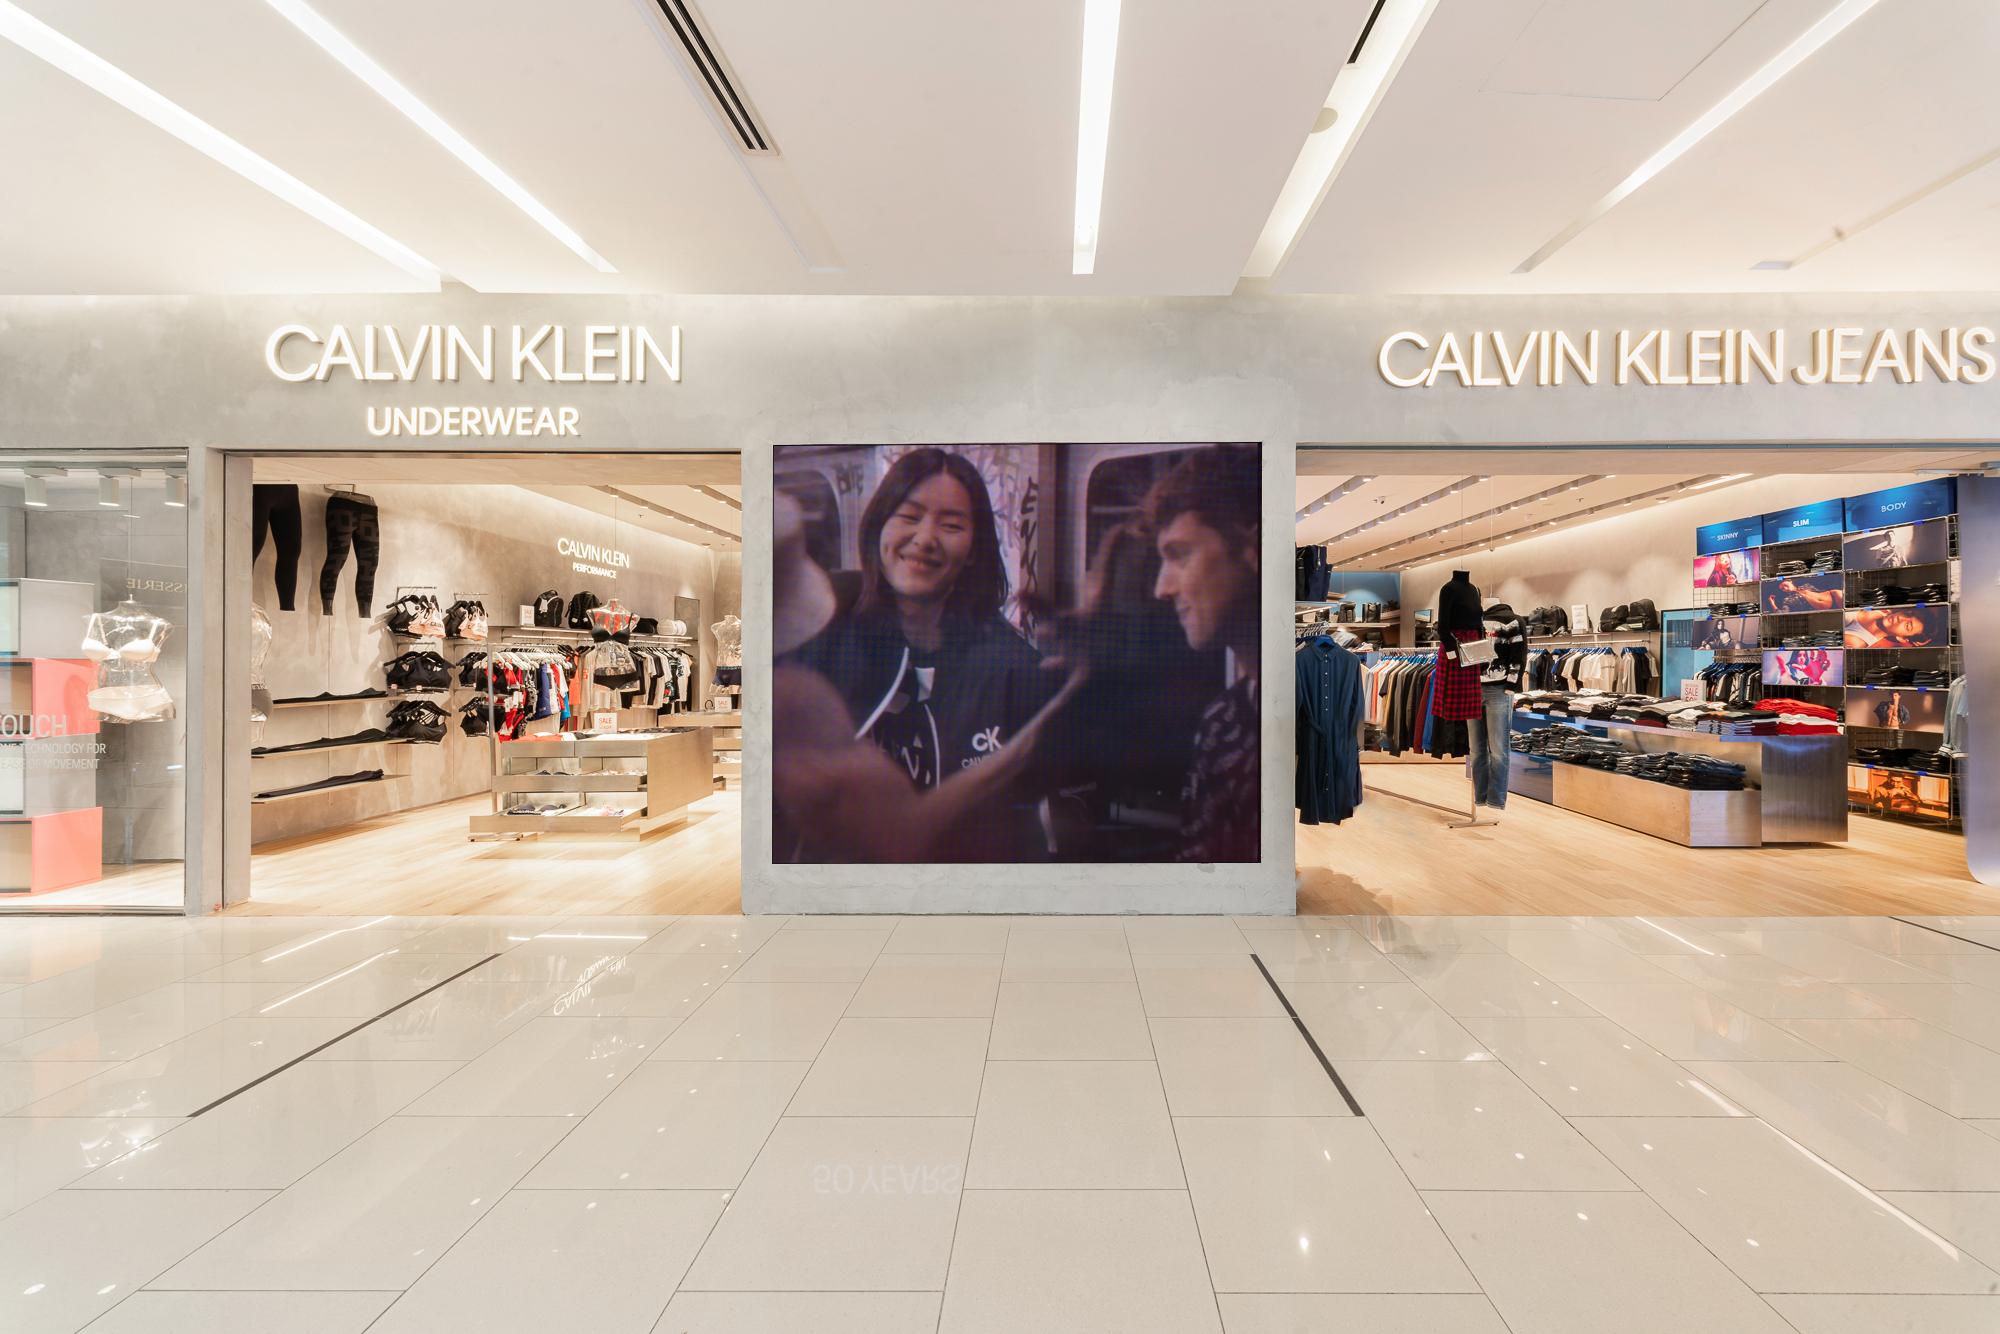 Cửa hàng Multi-brand của Calvin Klein tại Trung tâm thương mại Saigon Centre